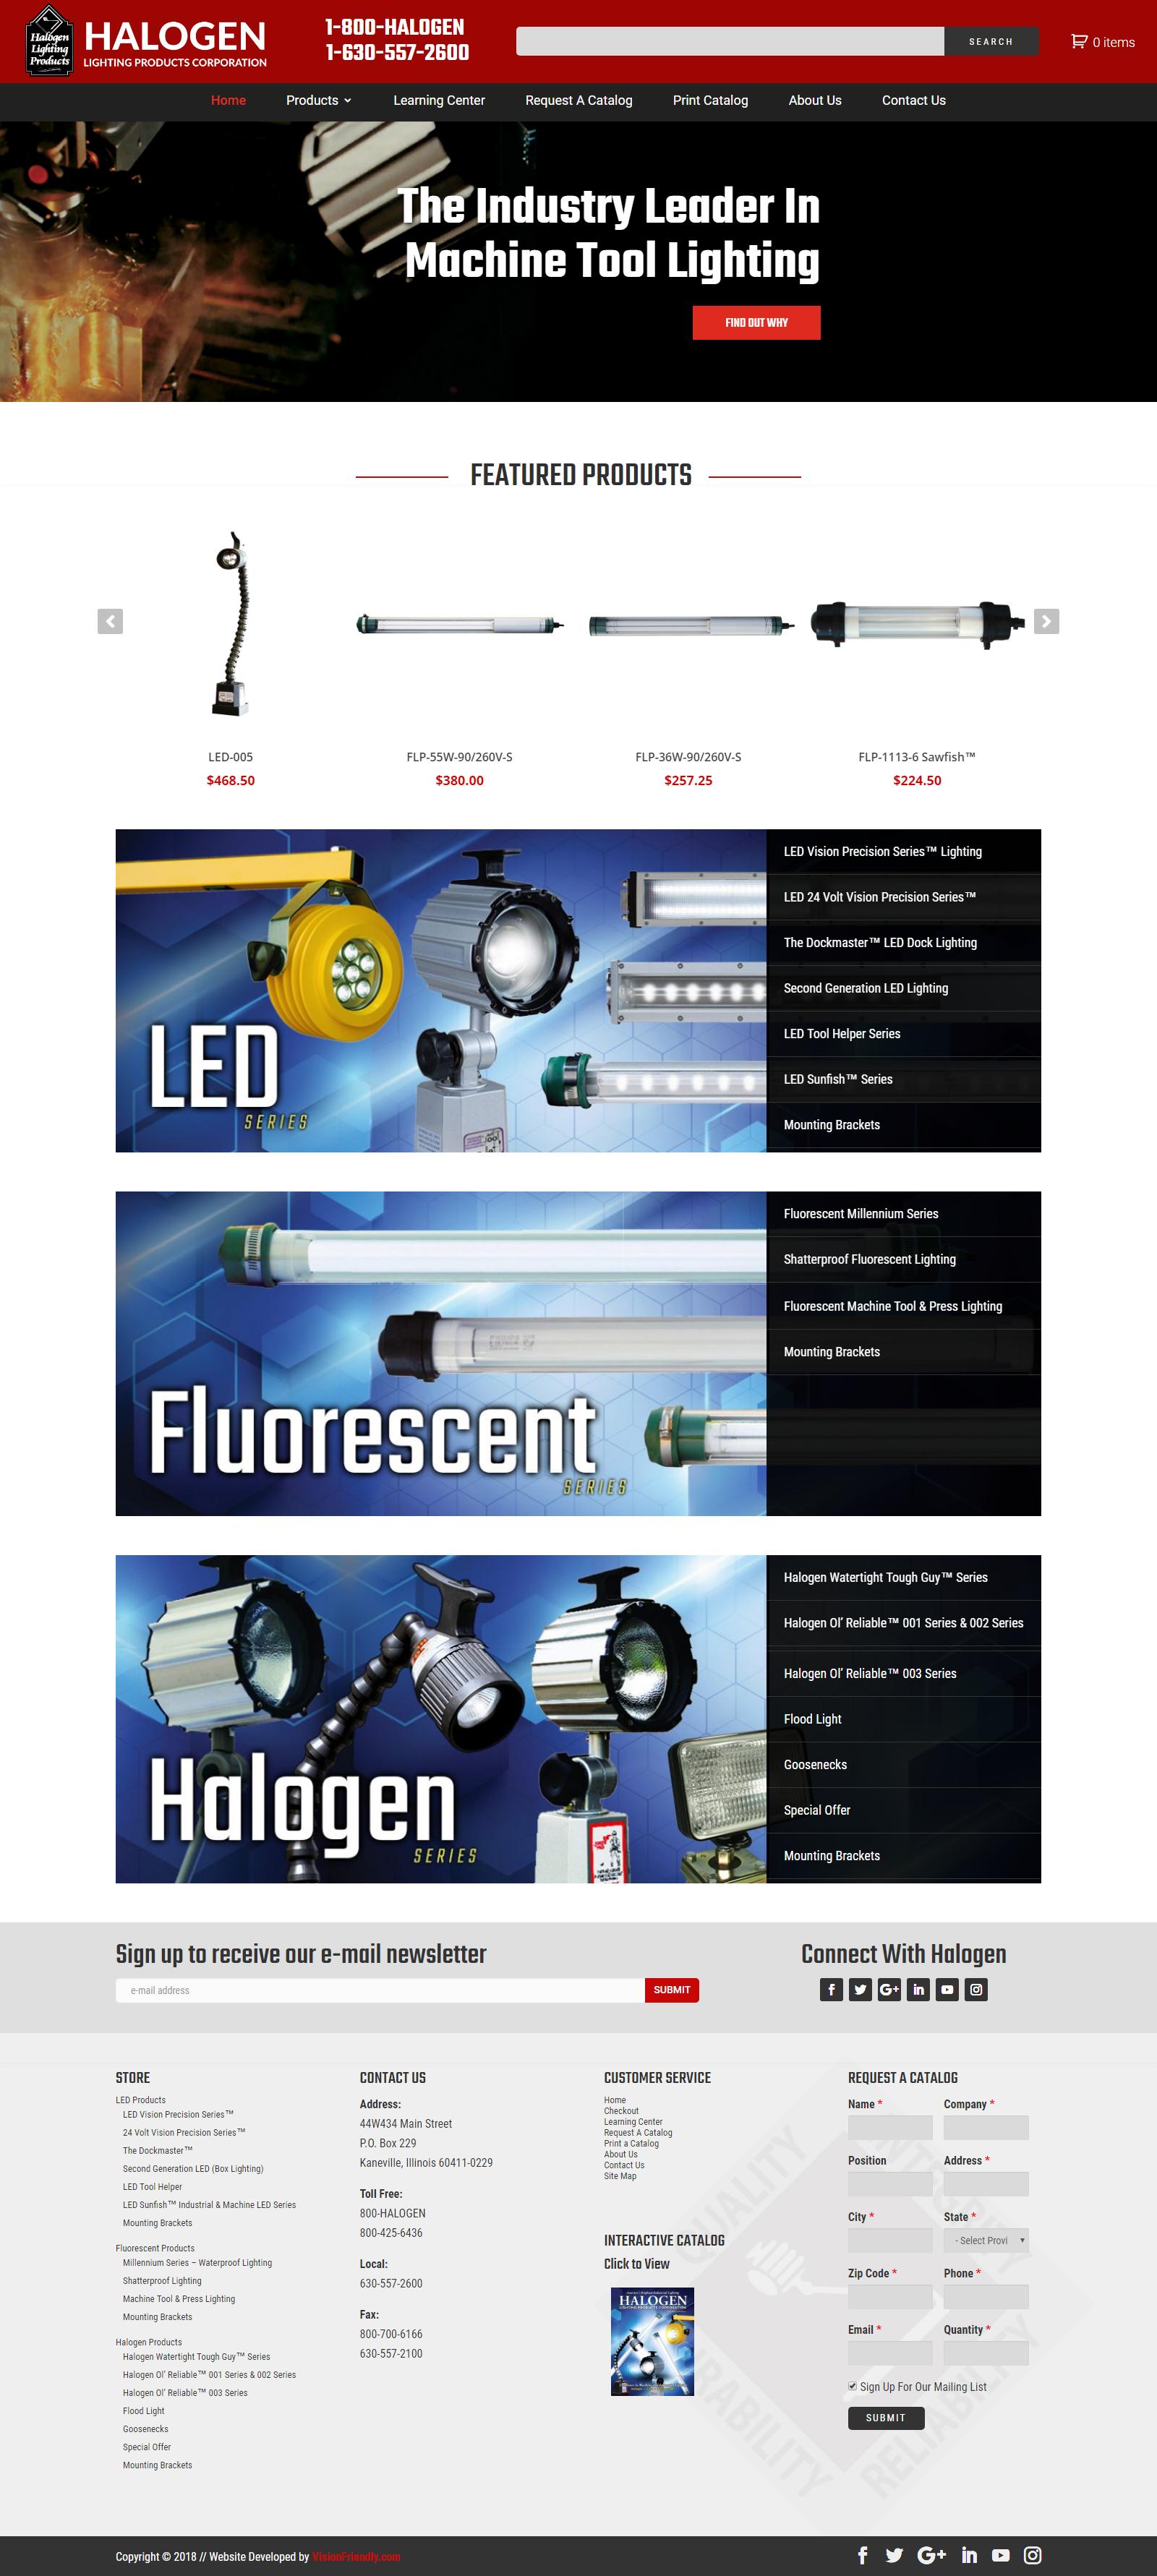 Website Design For Halogen Lighting Com By Visionfriendly Com Fullwidth Responsive Industrial Webdesign Webdevelopmen Website Design Web Design Naperville